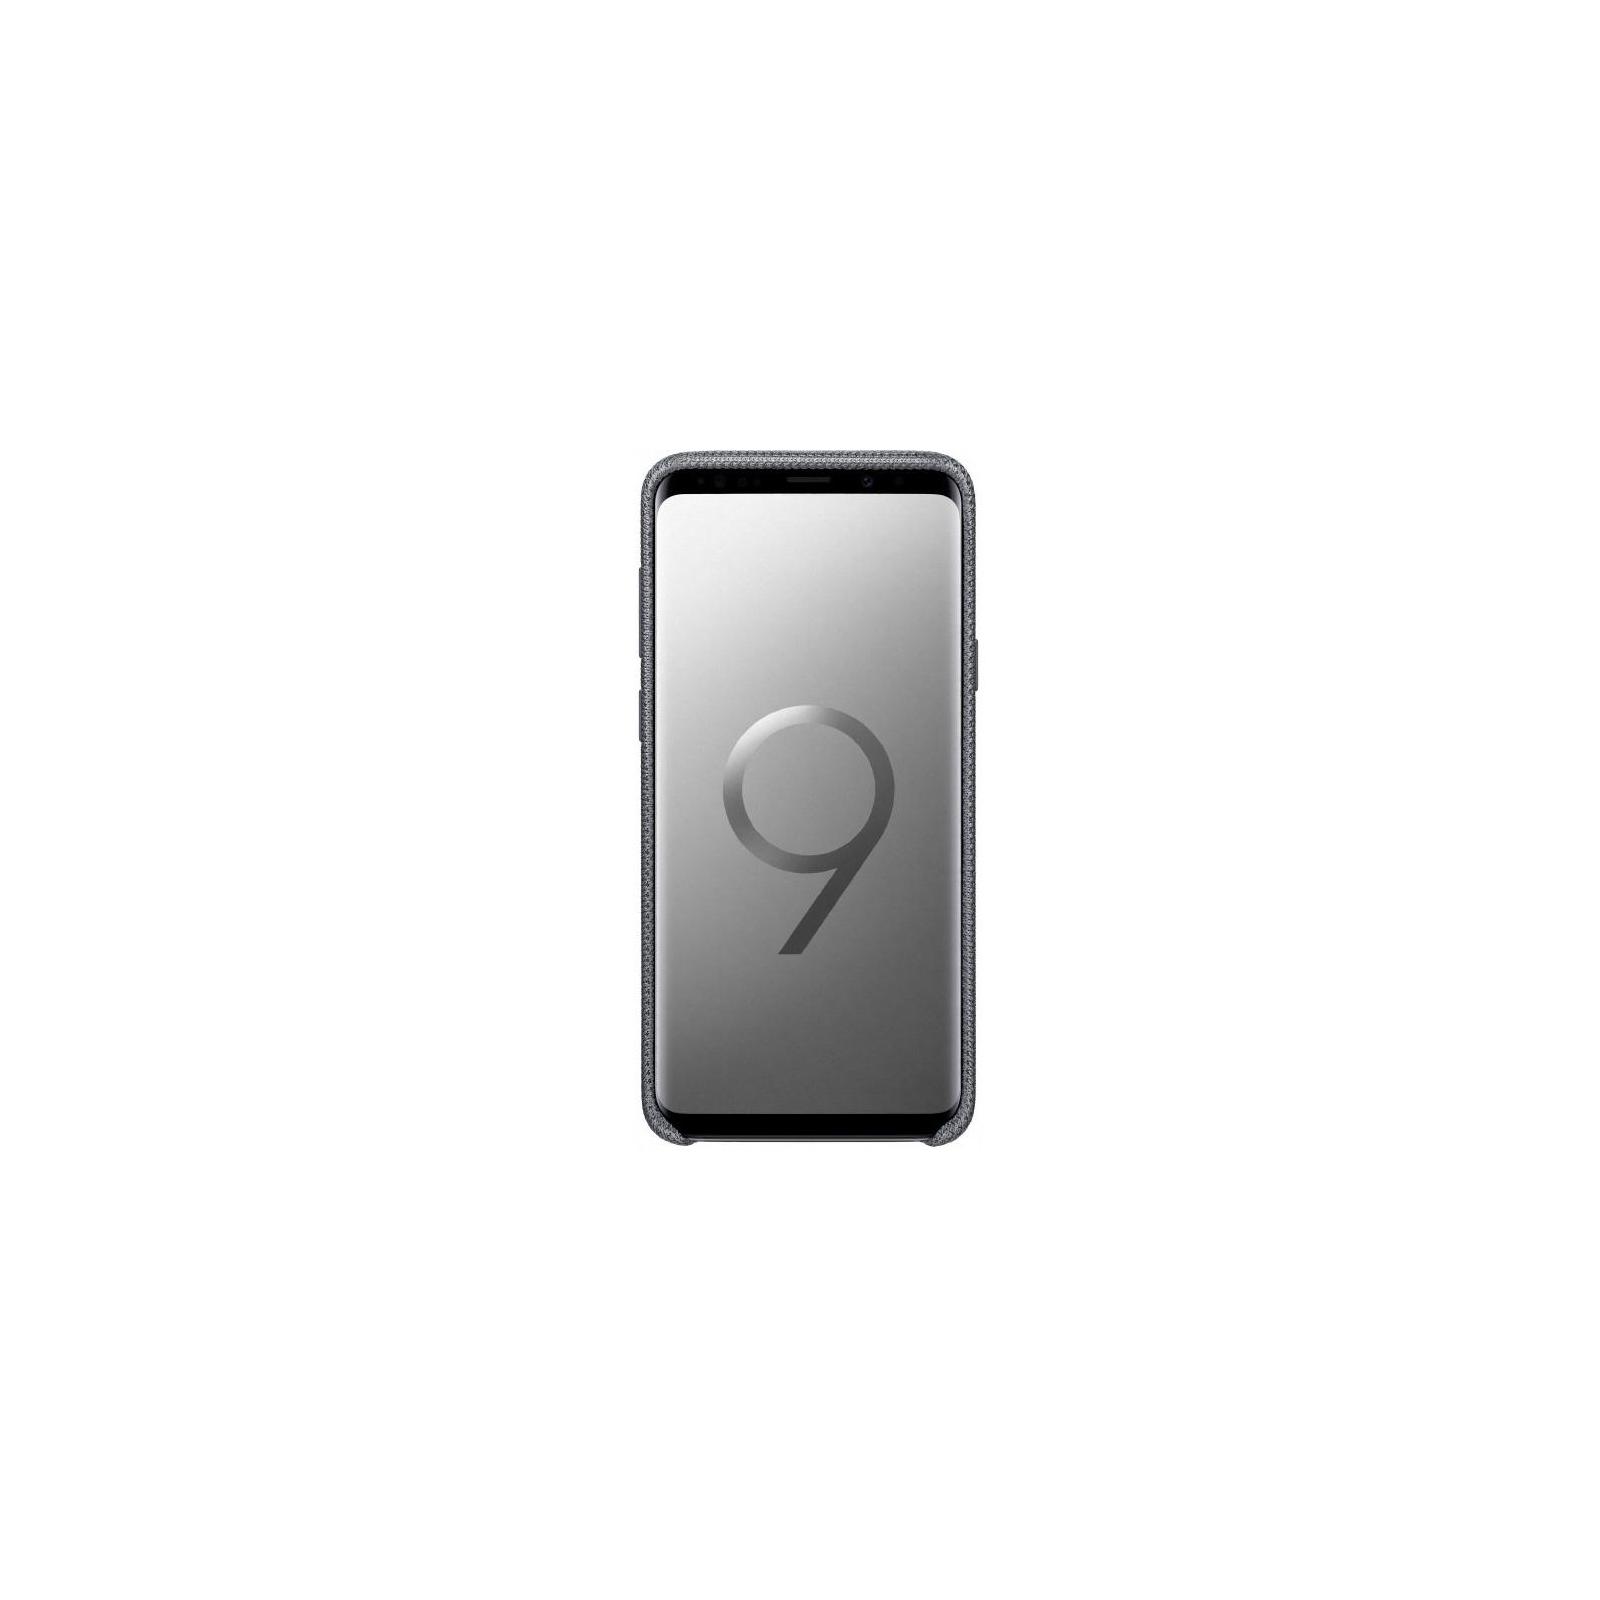 Чехол для моб. телефона Samsung для Galaxy S9+ (G965) Hyperknit Cover Grey (EF-GG965FJEGRU) изображение 5